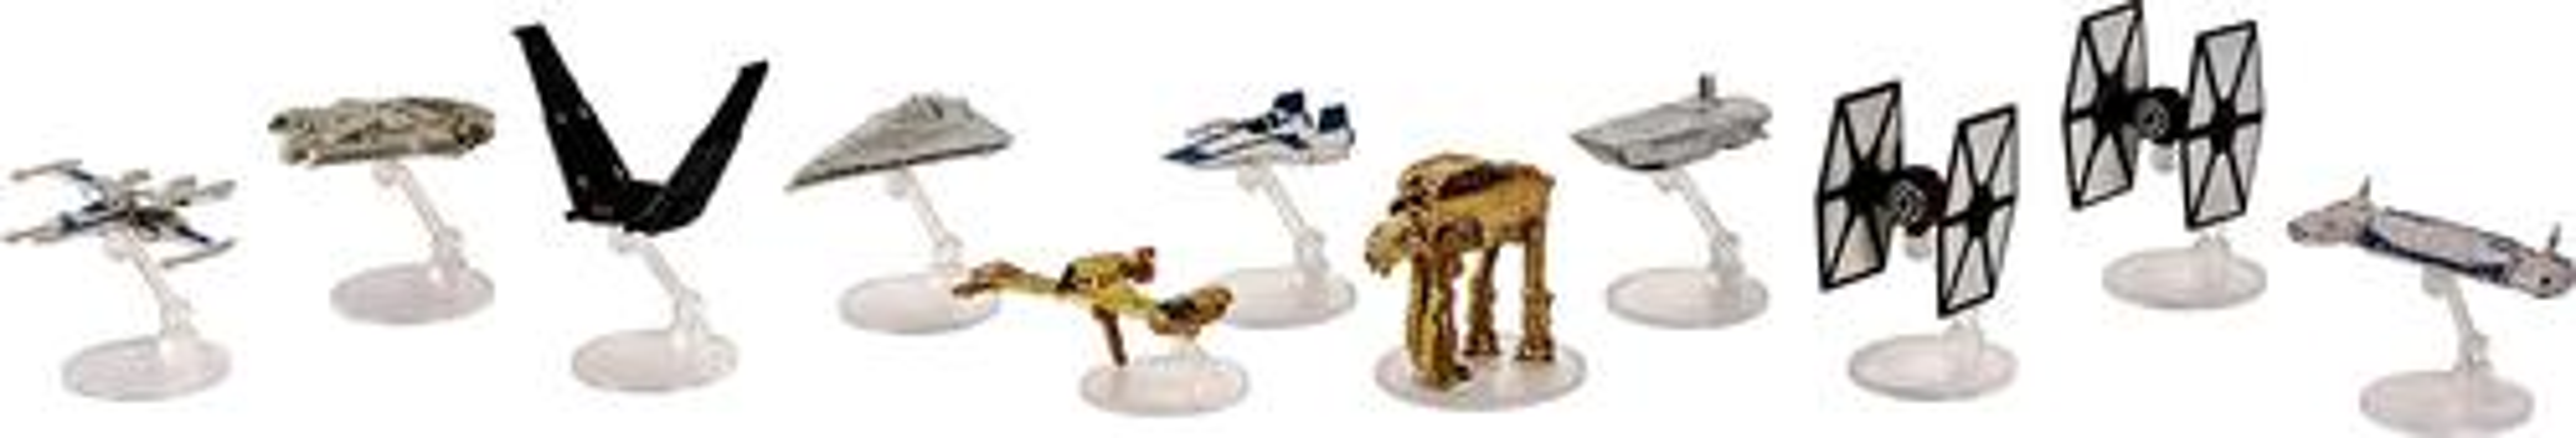 Mattel - Hot Wheels® Star Wars: The Last Jedi Starships (11-Pack) - Styles May Vary 6020907